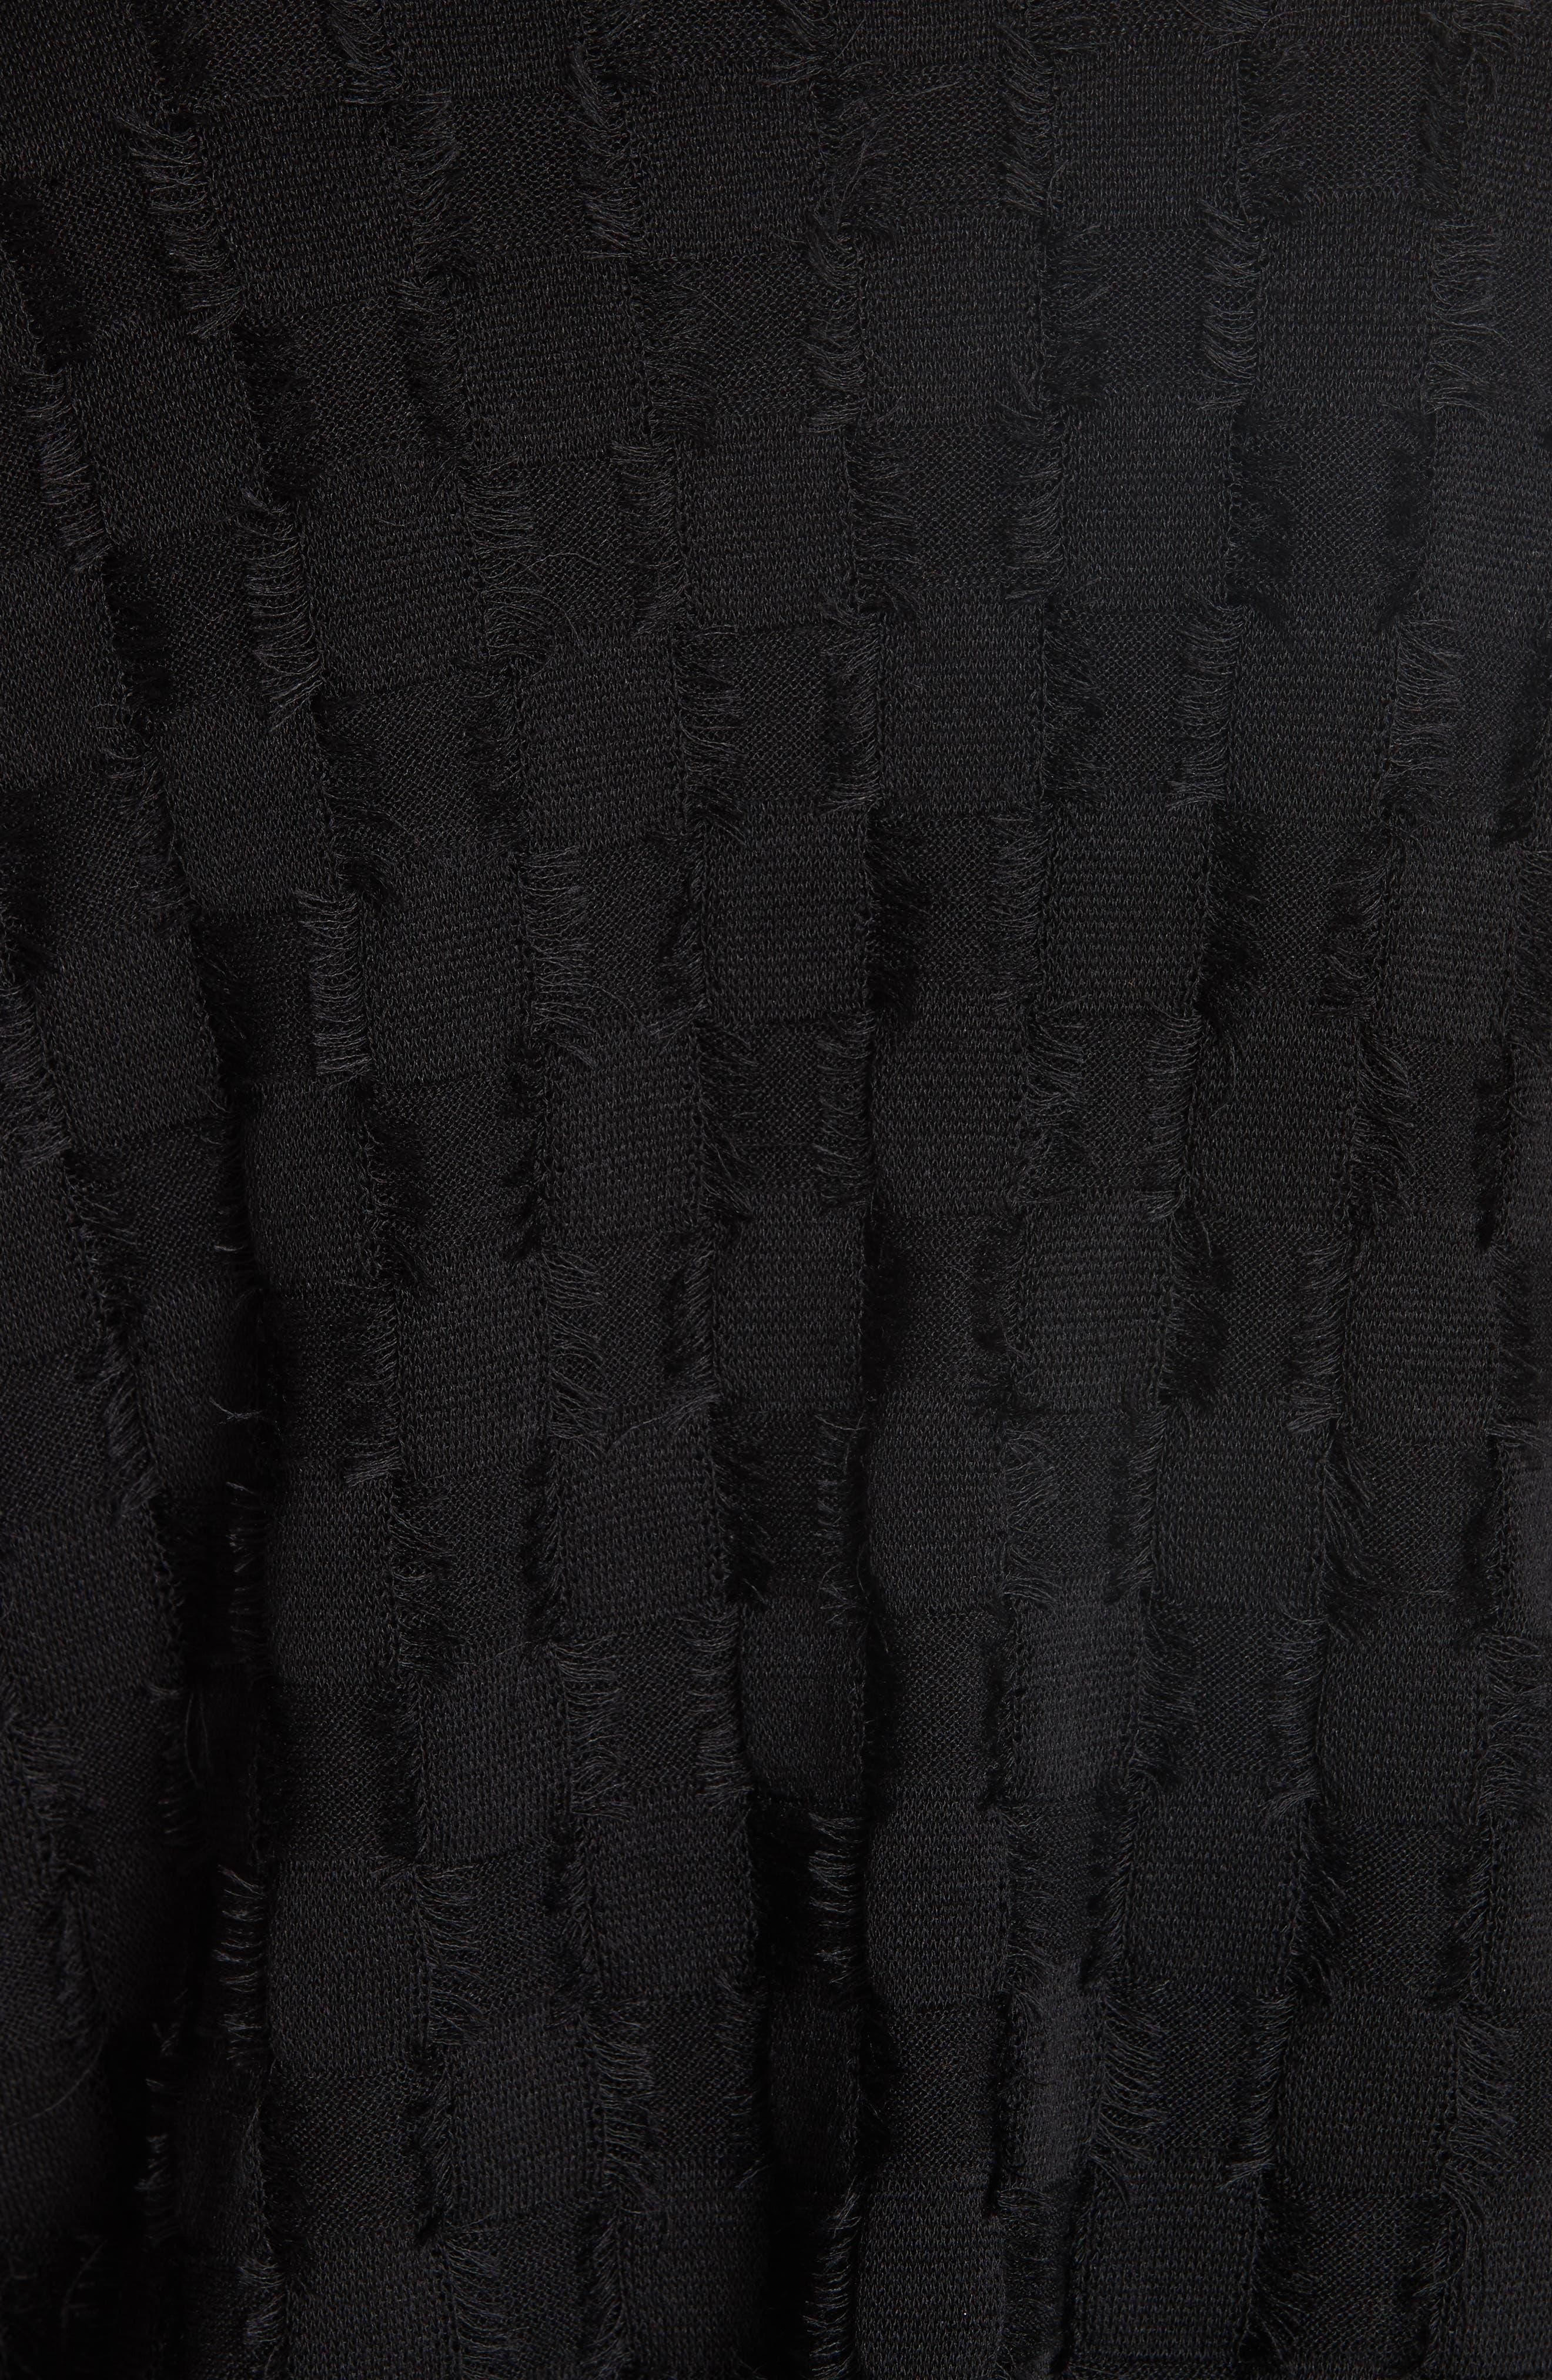 Fringe Knit Sweater,                             Alternate thumbnail 5, color,                             001